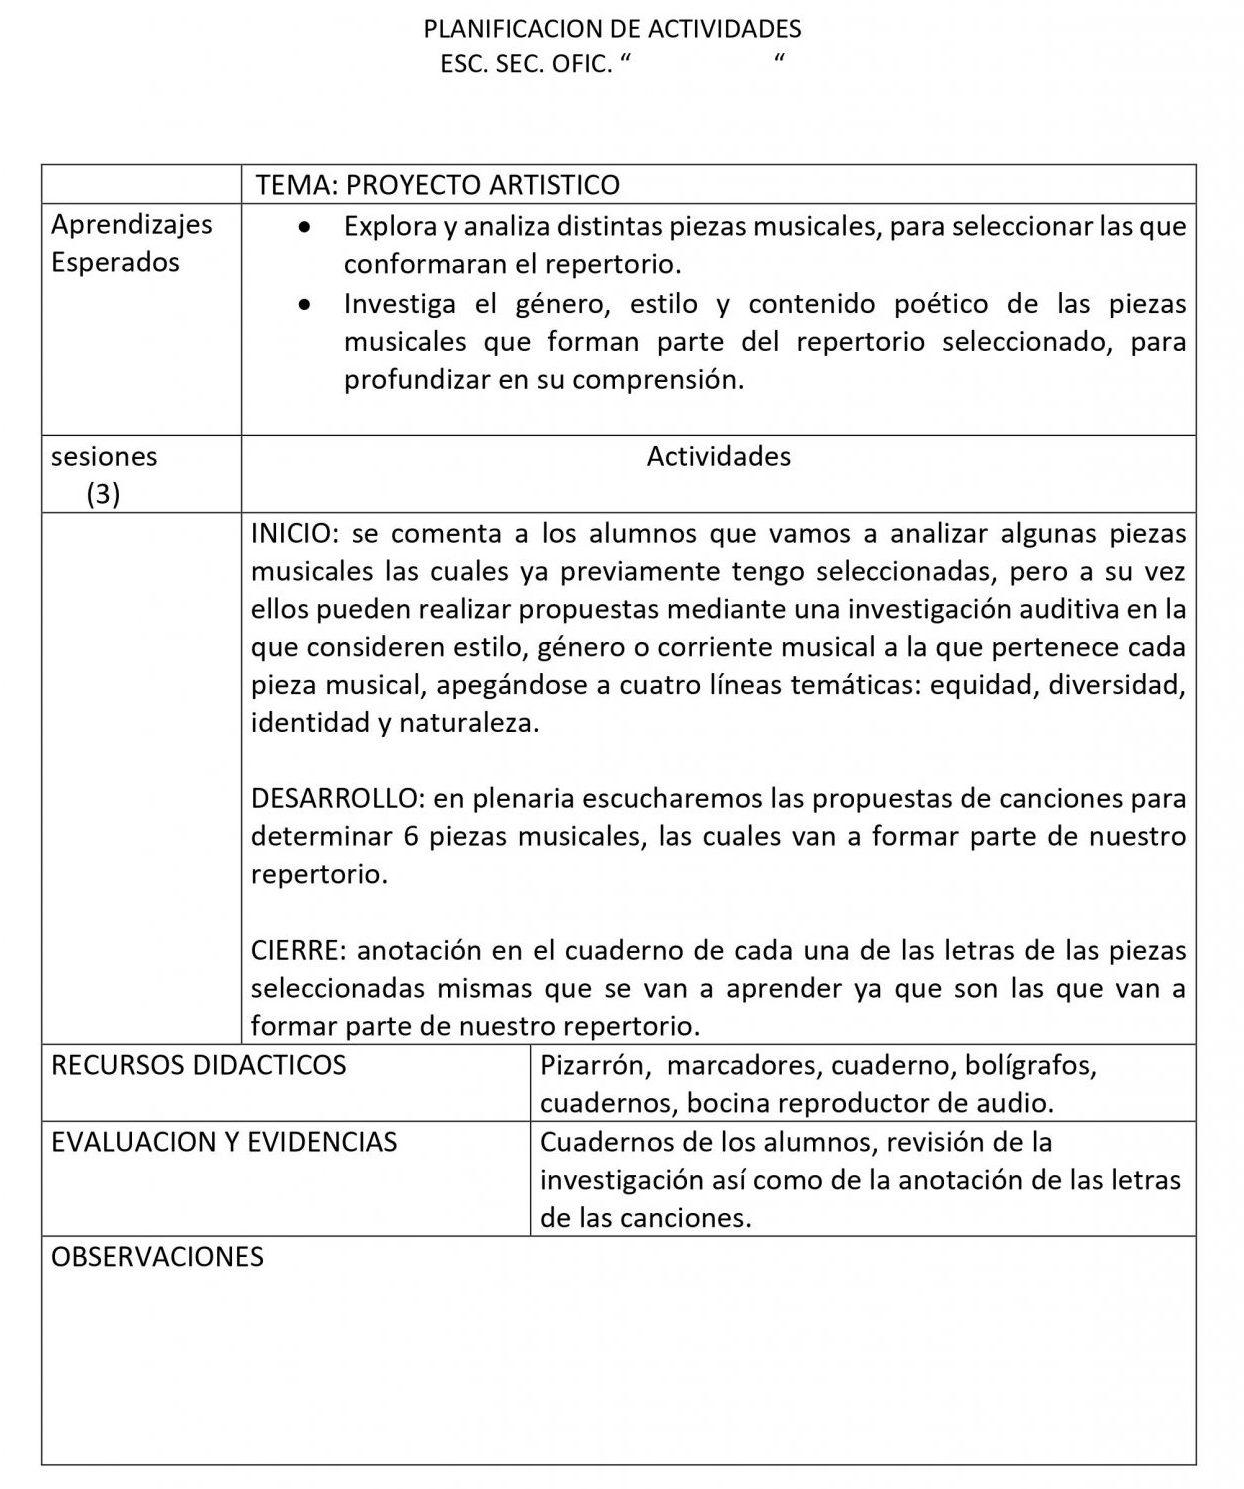 Planeaciones Artes Musica 1 Secundaria (Nuevo Modelo Educativo) 1er. Trimestre 03